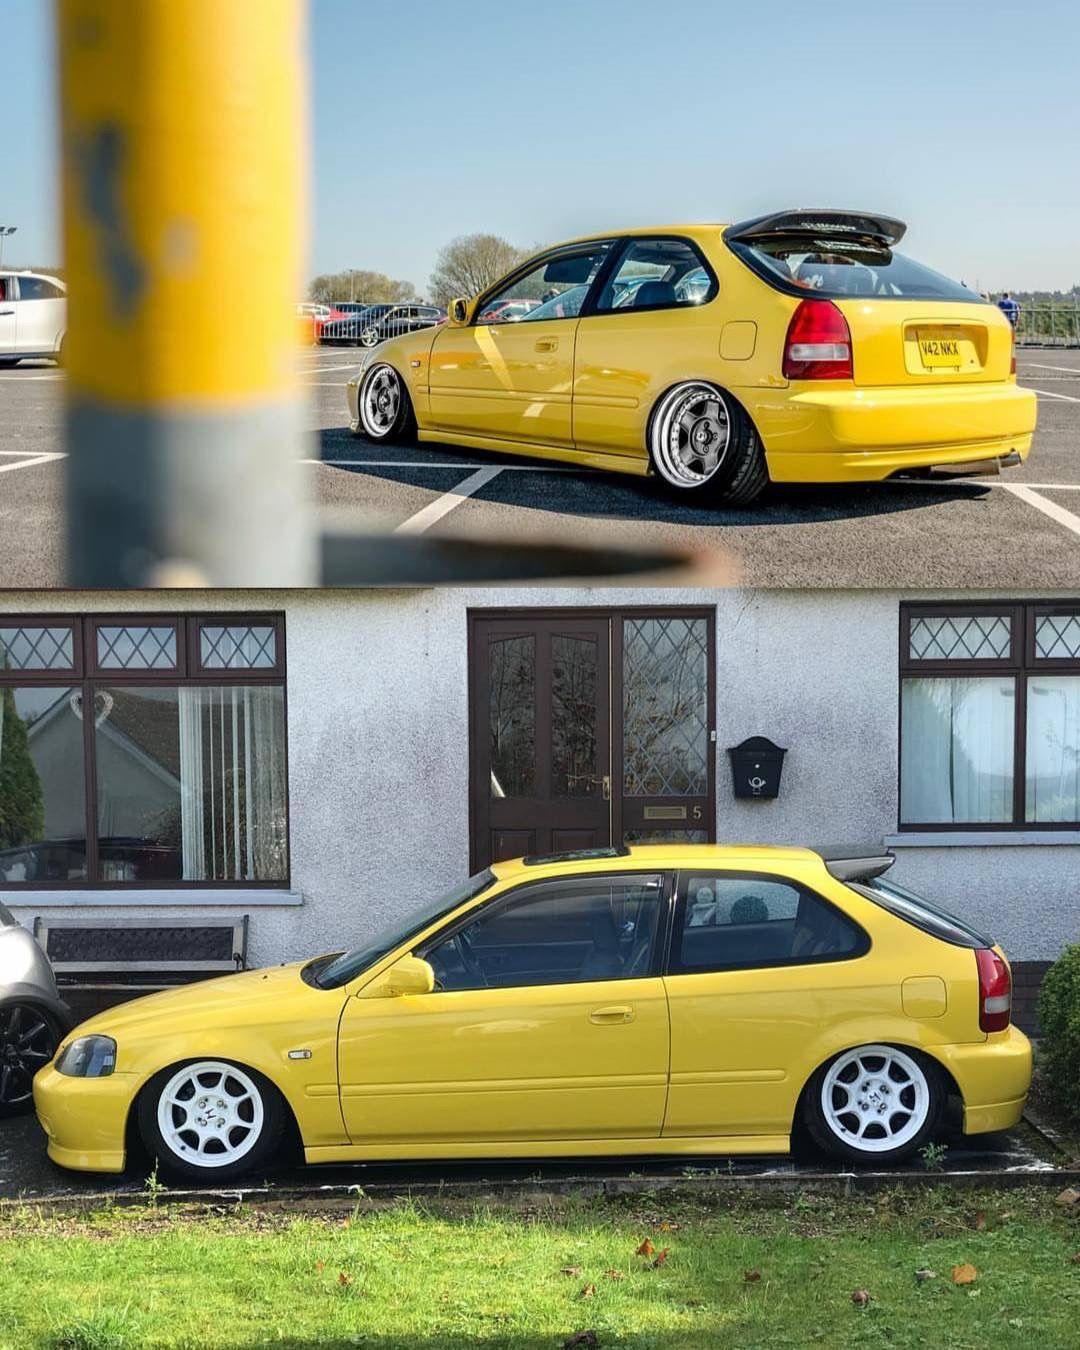 Yellow Ek Hatchback Honda Civic Hatchback Honda Civic Civic Hatchback